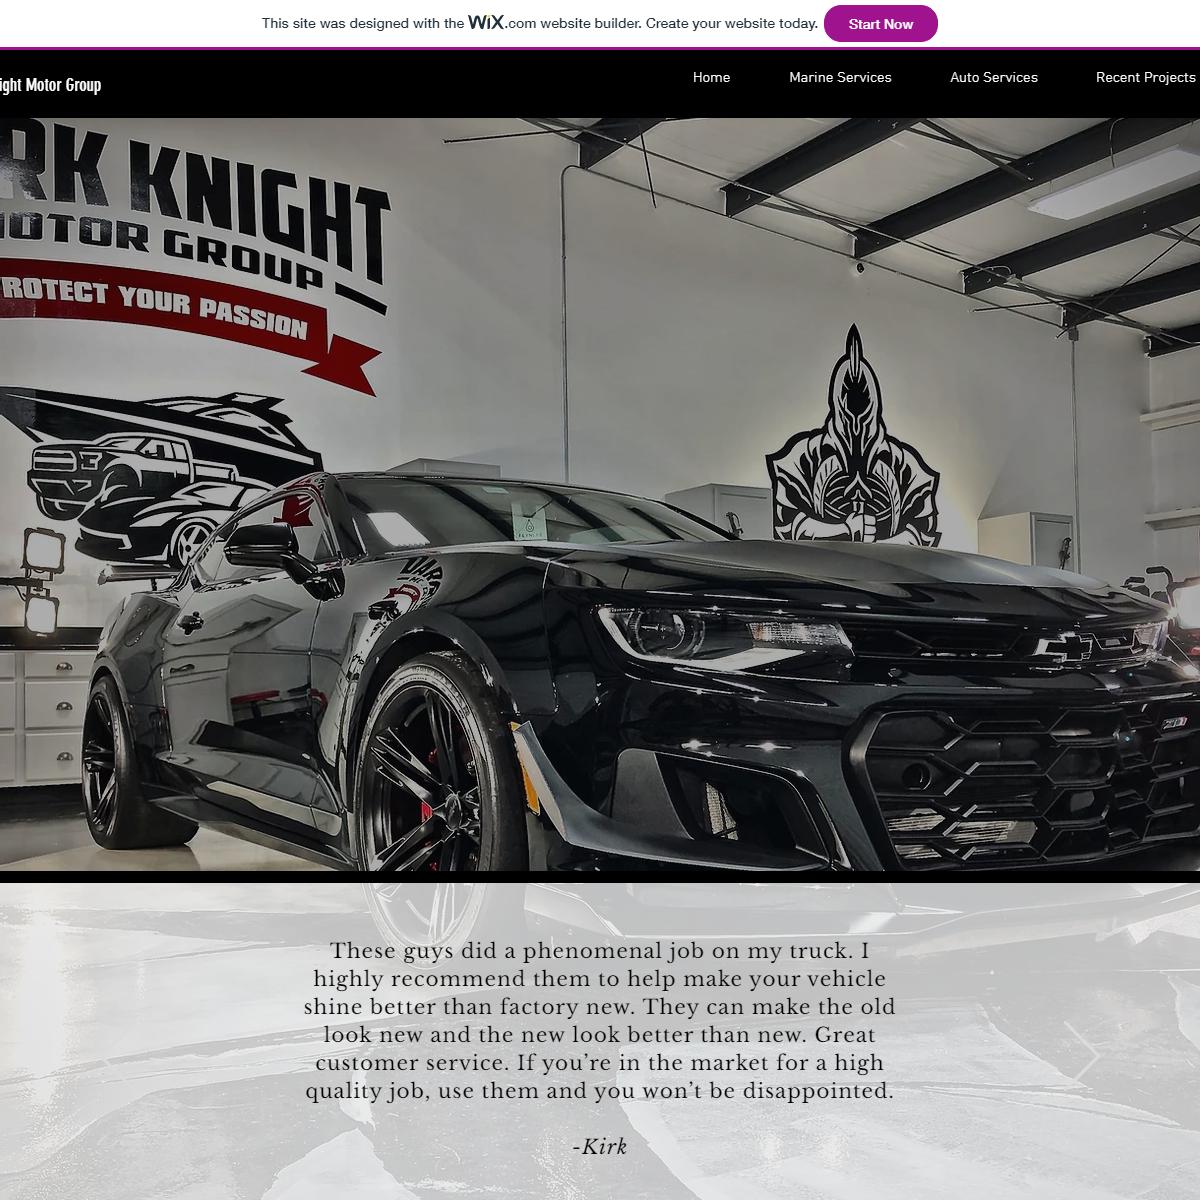 Elite Auto & Marine Detailers - Dark Knight Motor Group